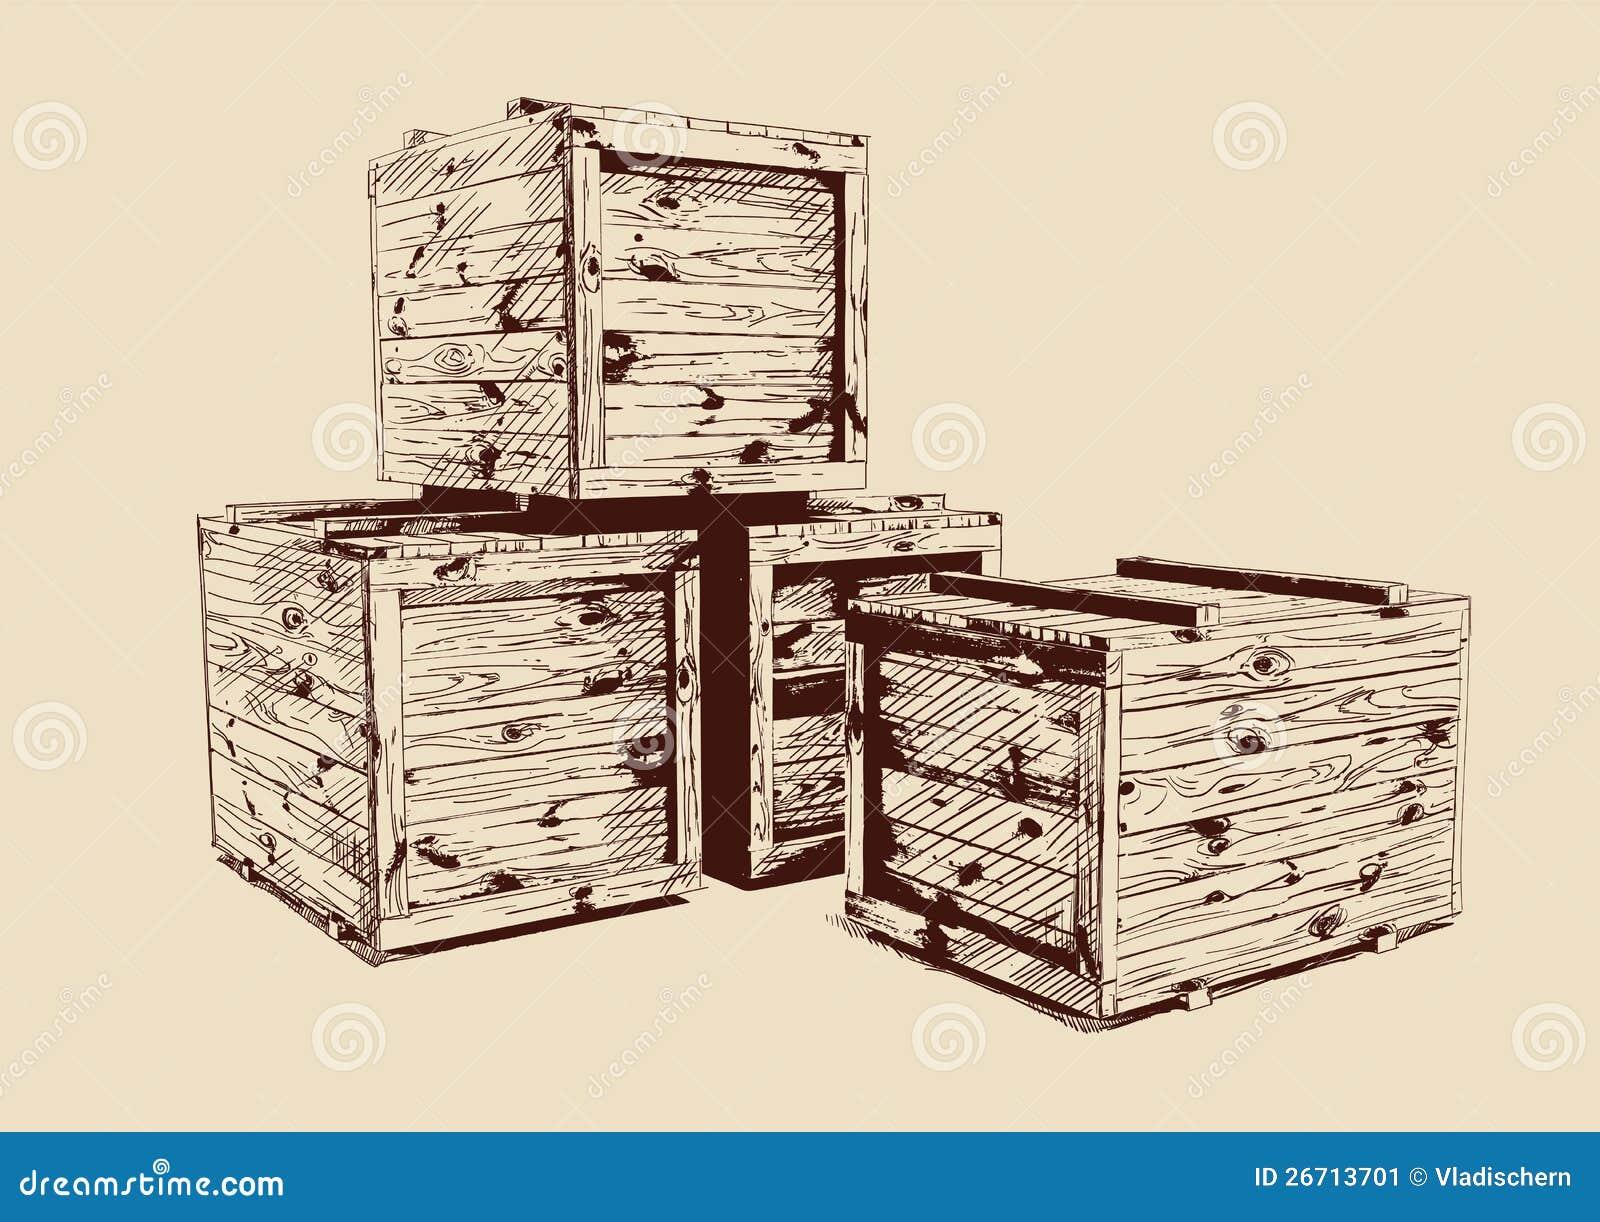 vintage wooden crates drawn stock image image 26713701